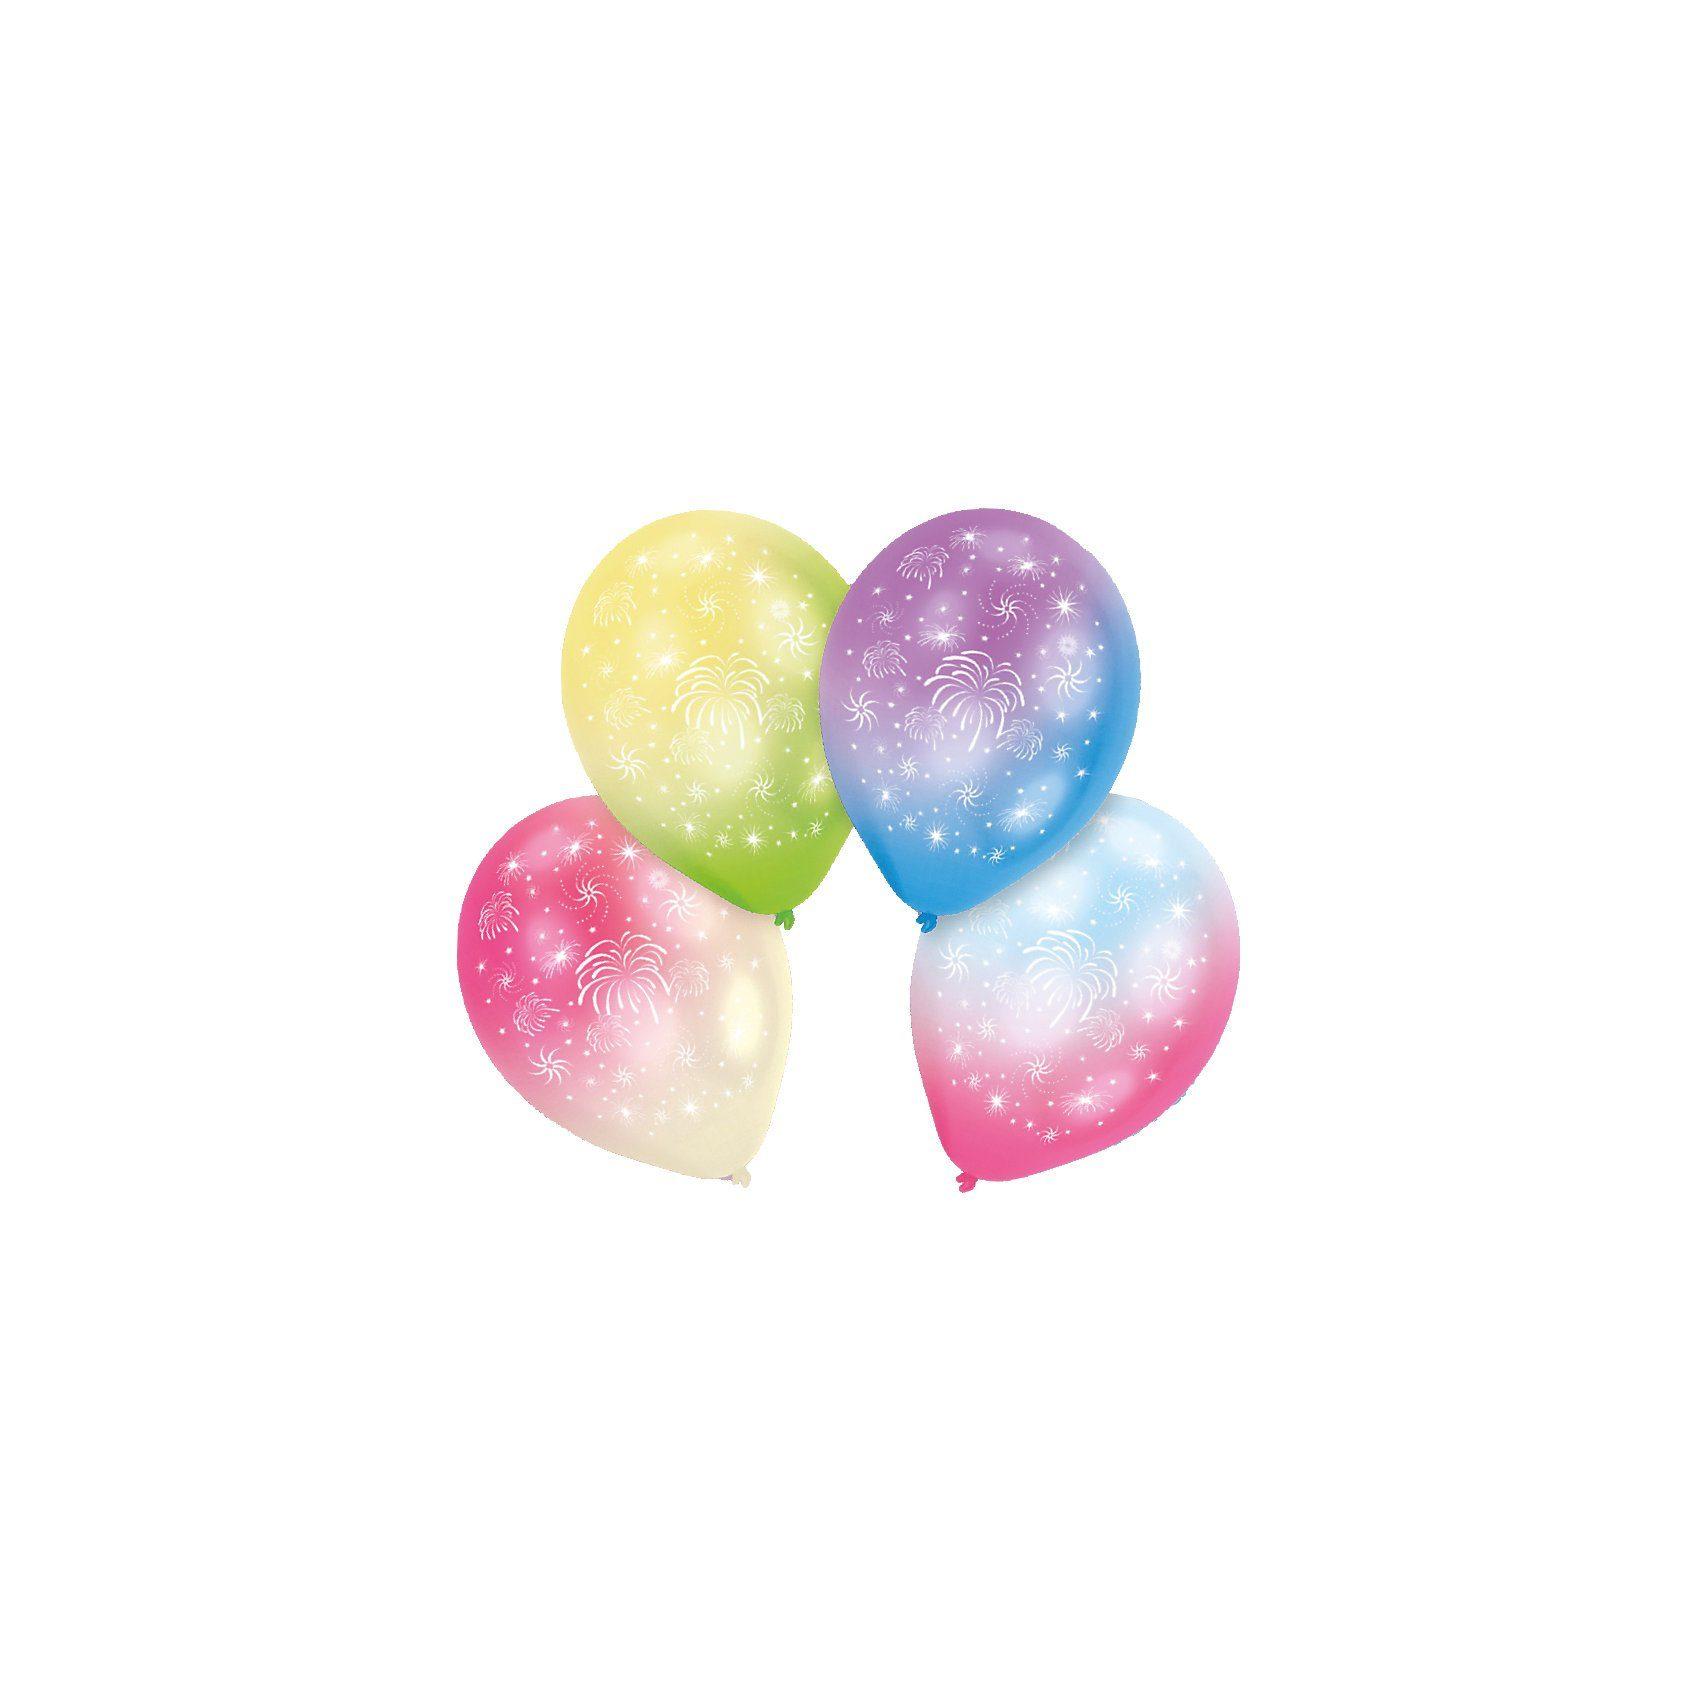 Amscan LED Luftballons Feuerwerk, 4 Stück